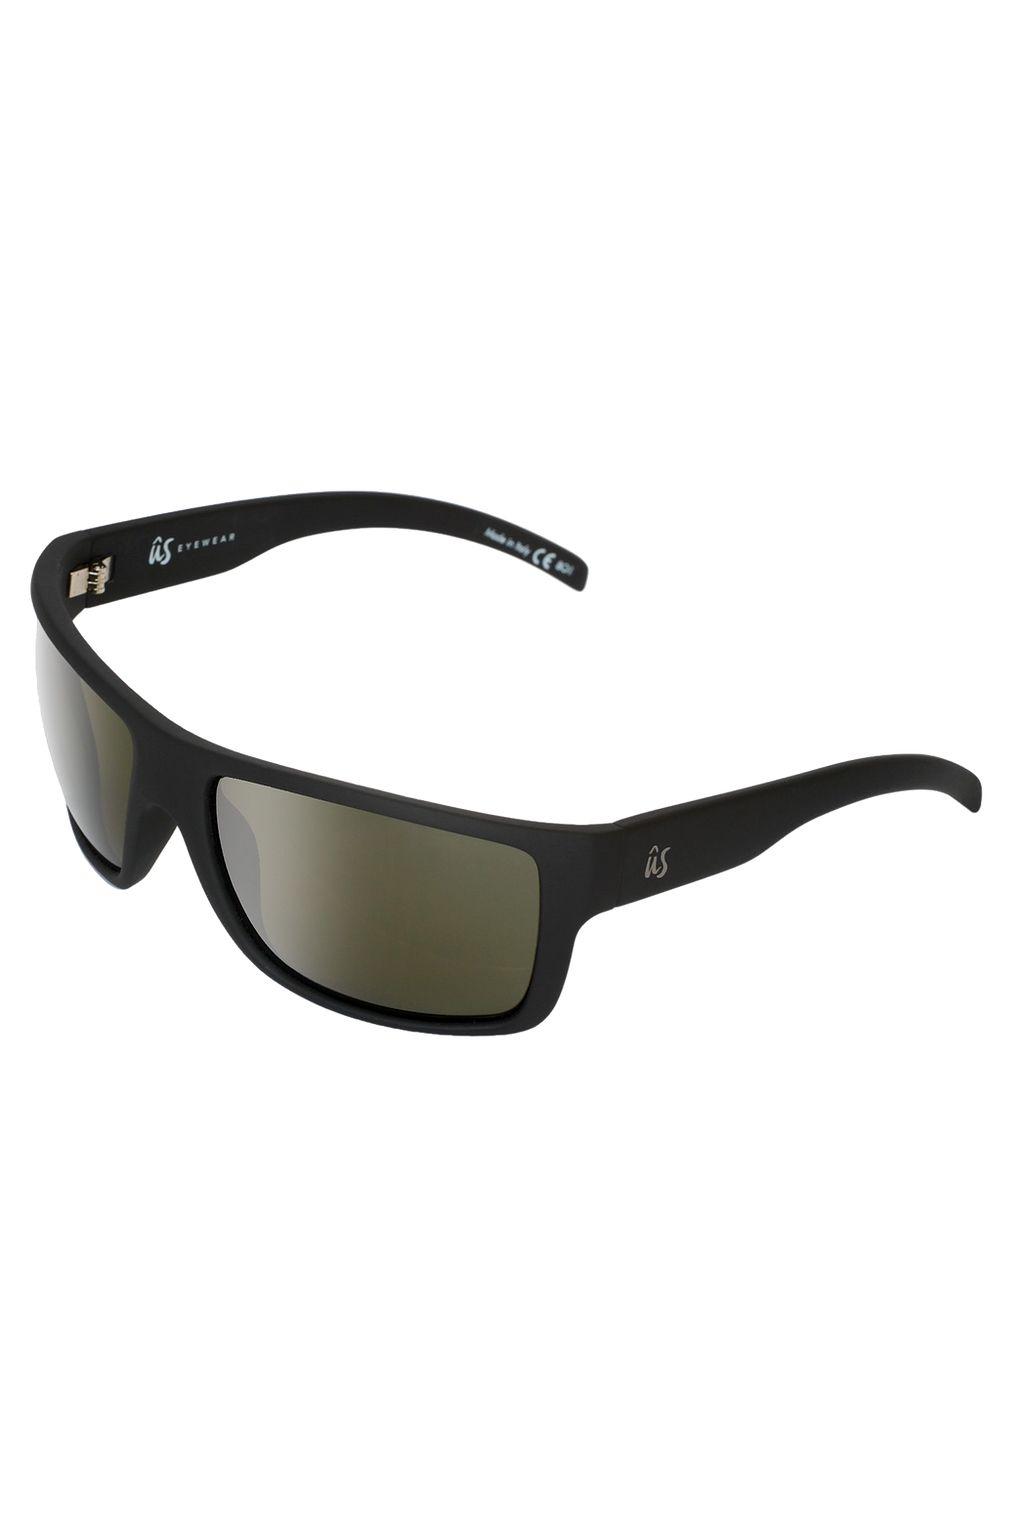 US Sunglasses TATOU Matte Black/Vintage Grey Polarized